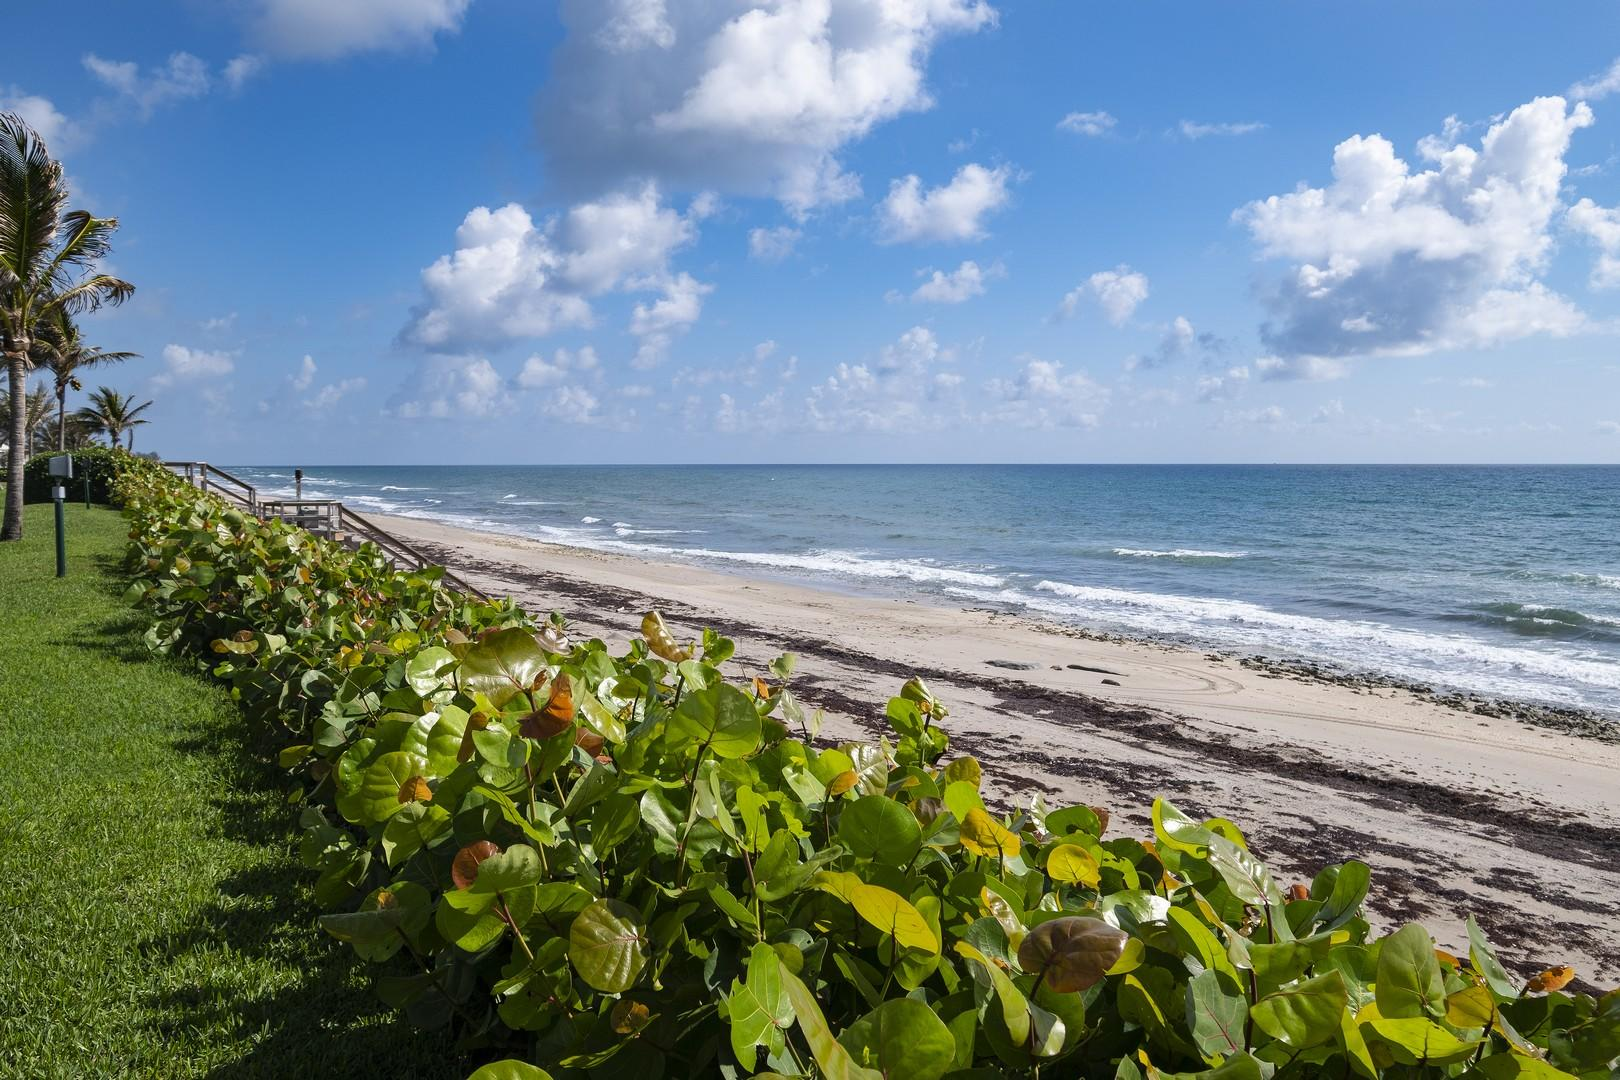 LOST TREE VILLAGE NORTH PALM BEACH REAL ESTATE